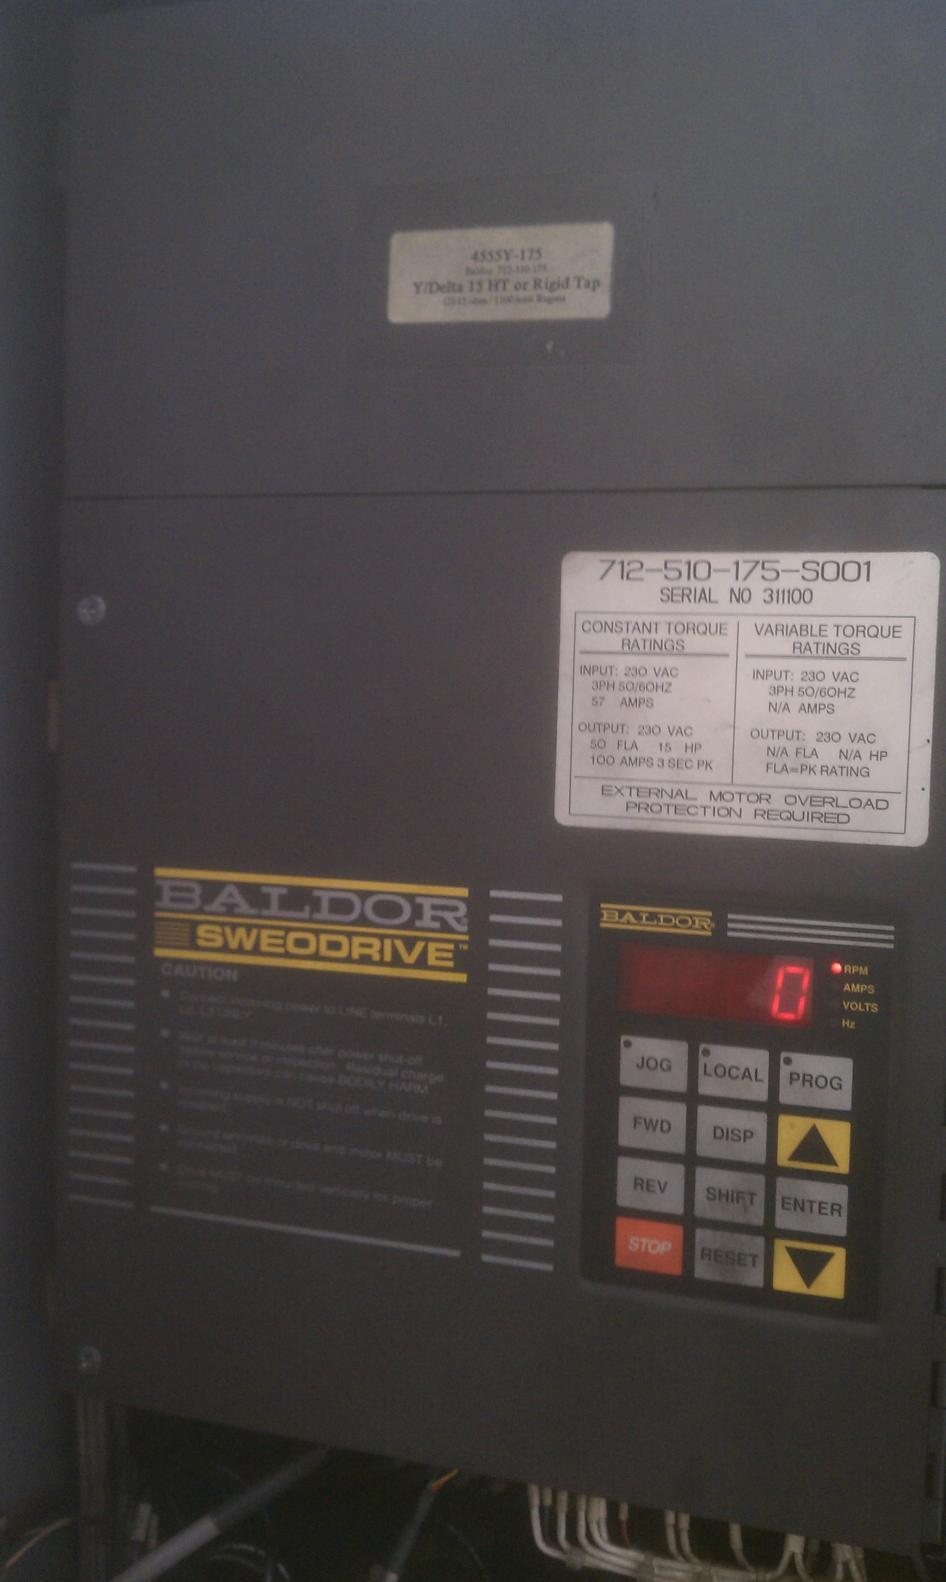 550048 powerflex dc drive selection for a baldor motor.